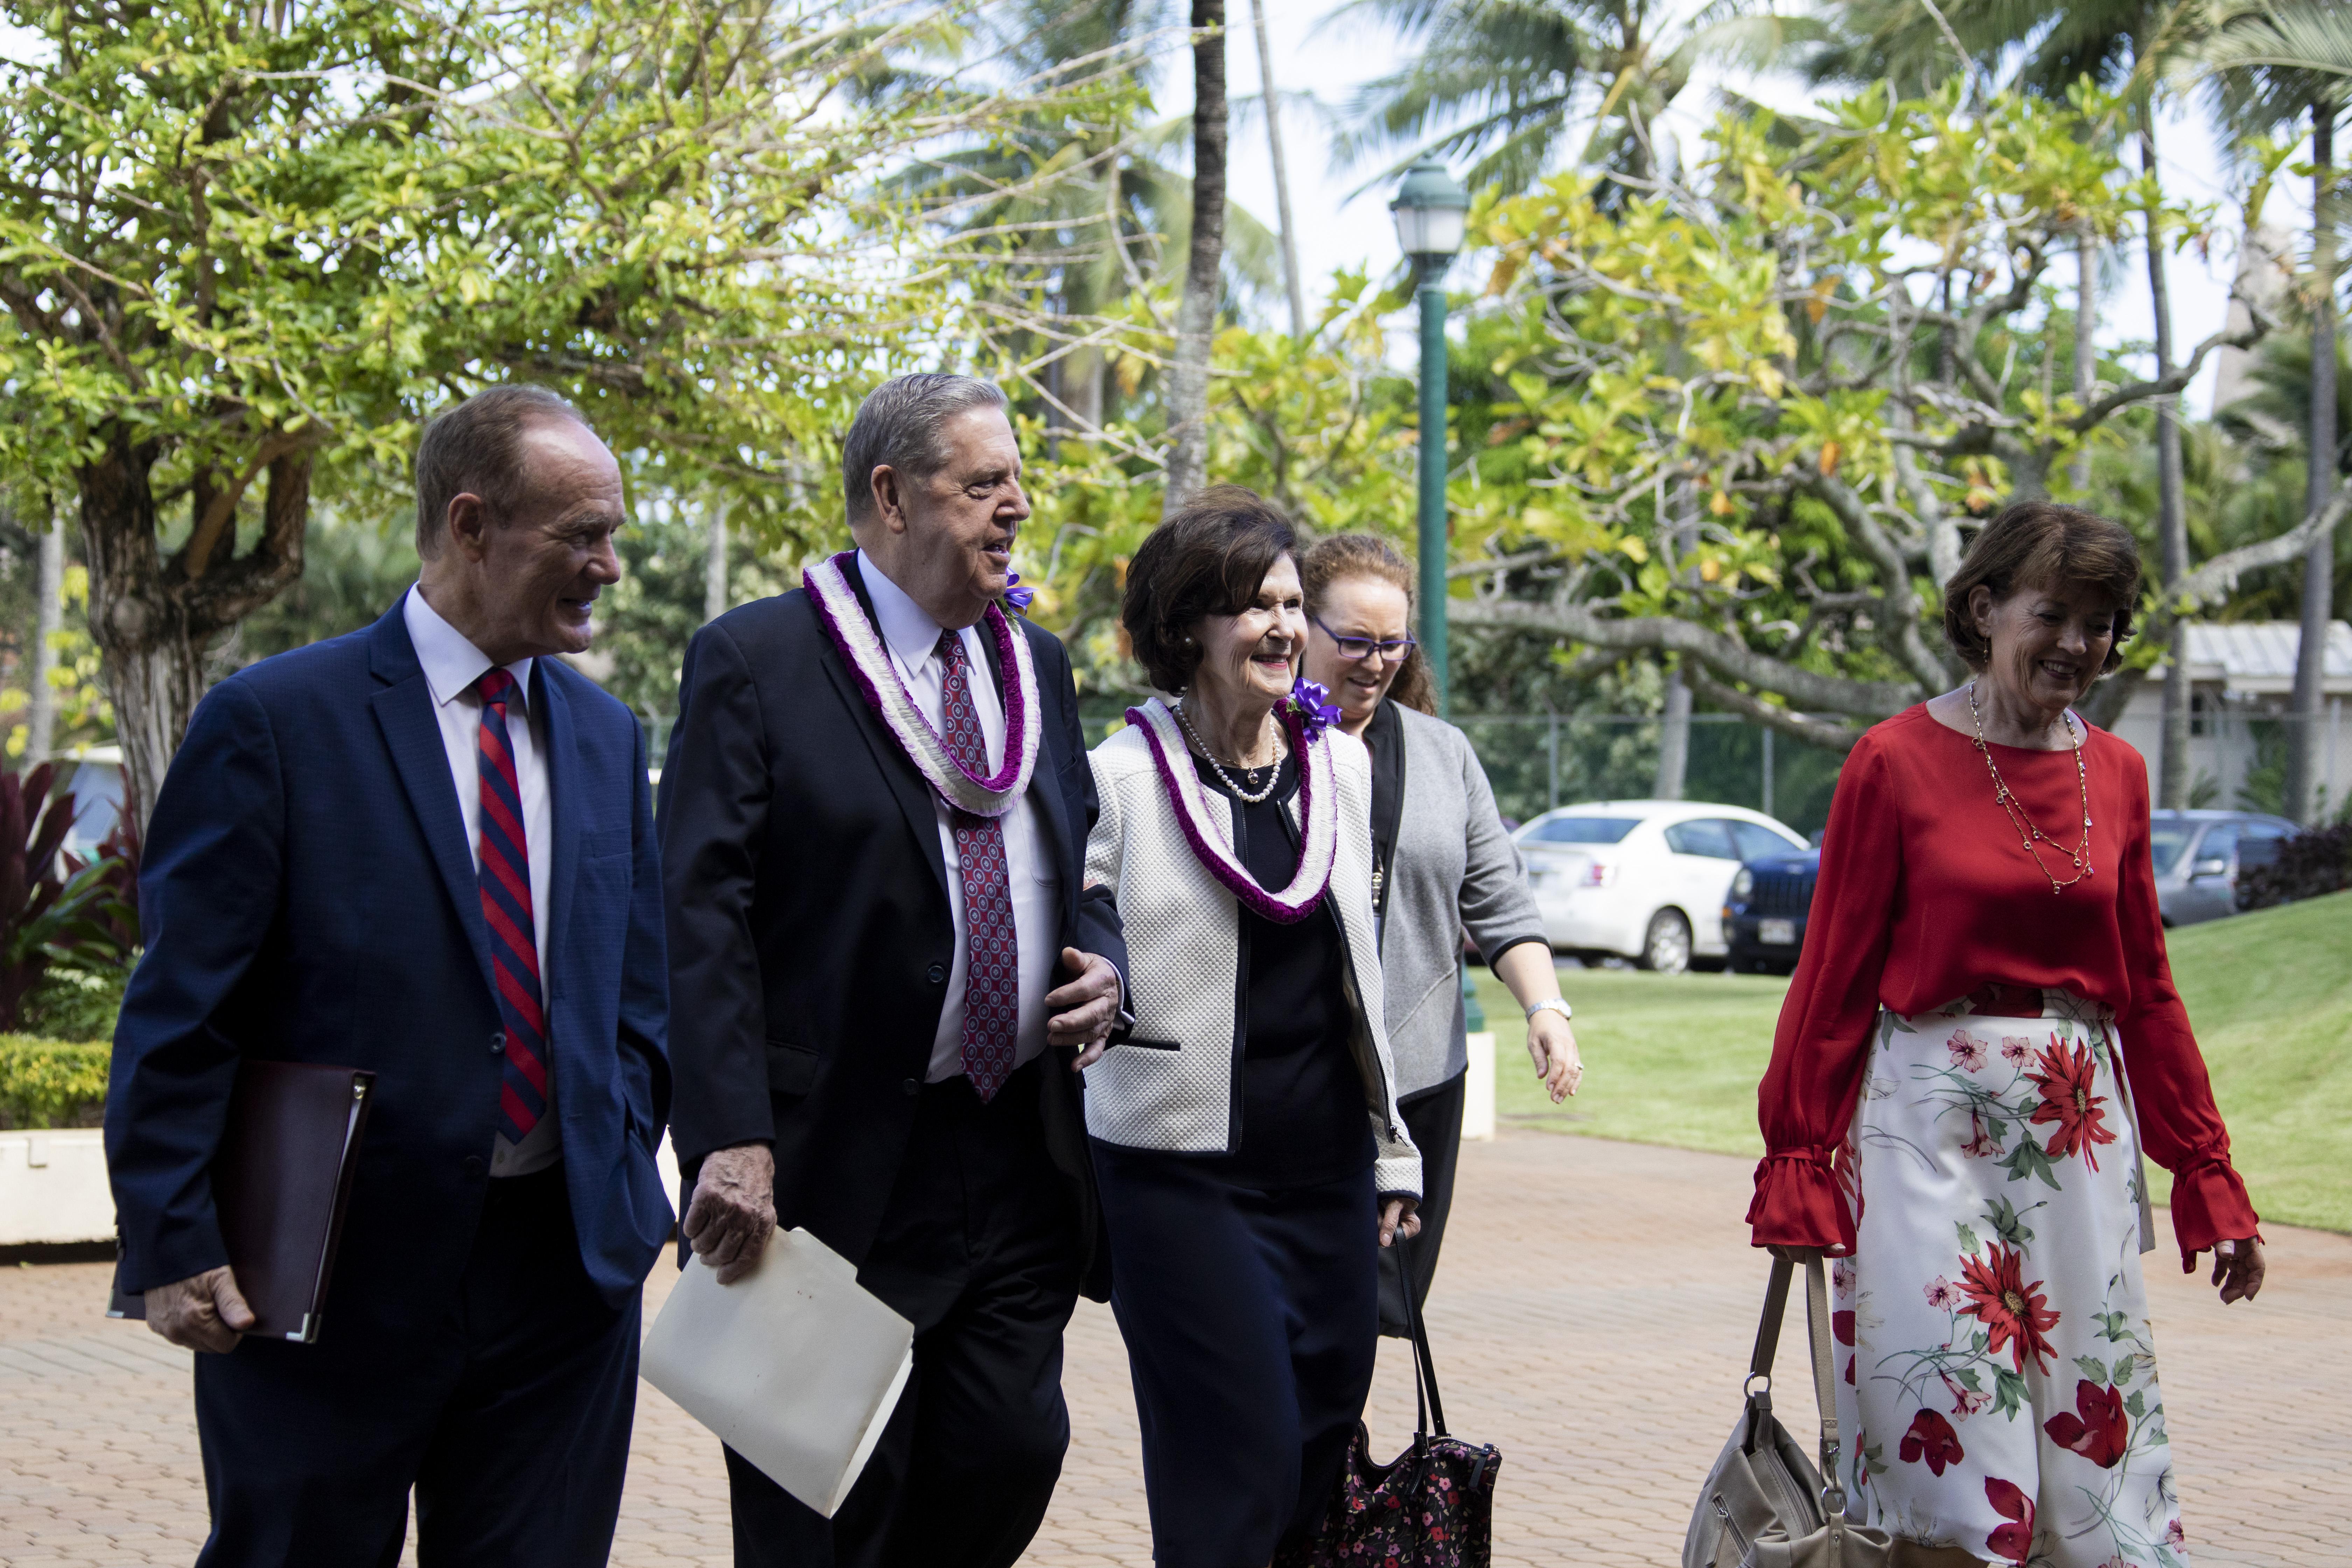 Da esquerda: presidente John S. Tanner, presidente da BYU-Havaí; élder Jeffrey R. Holland; irmã Patricia Holland; e irmã Susan W. Tanner andam no campus da BYU-Havaí no dia 22 de outubro.